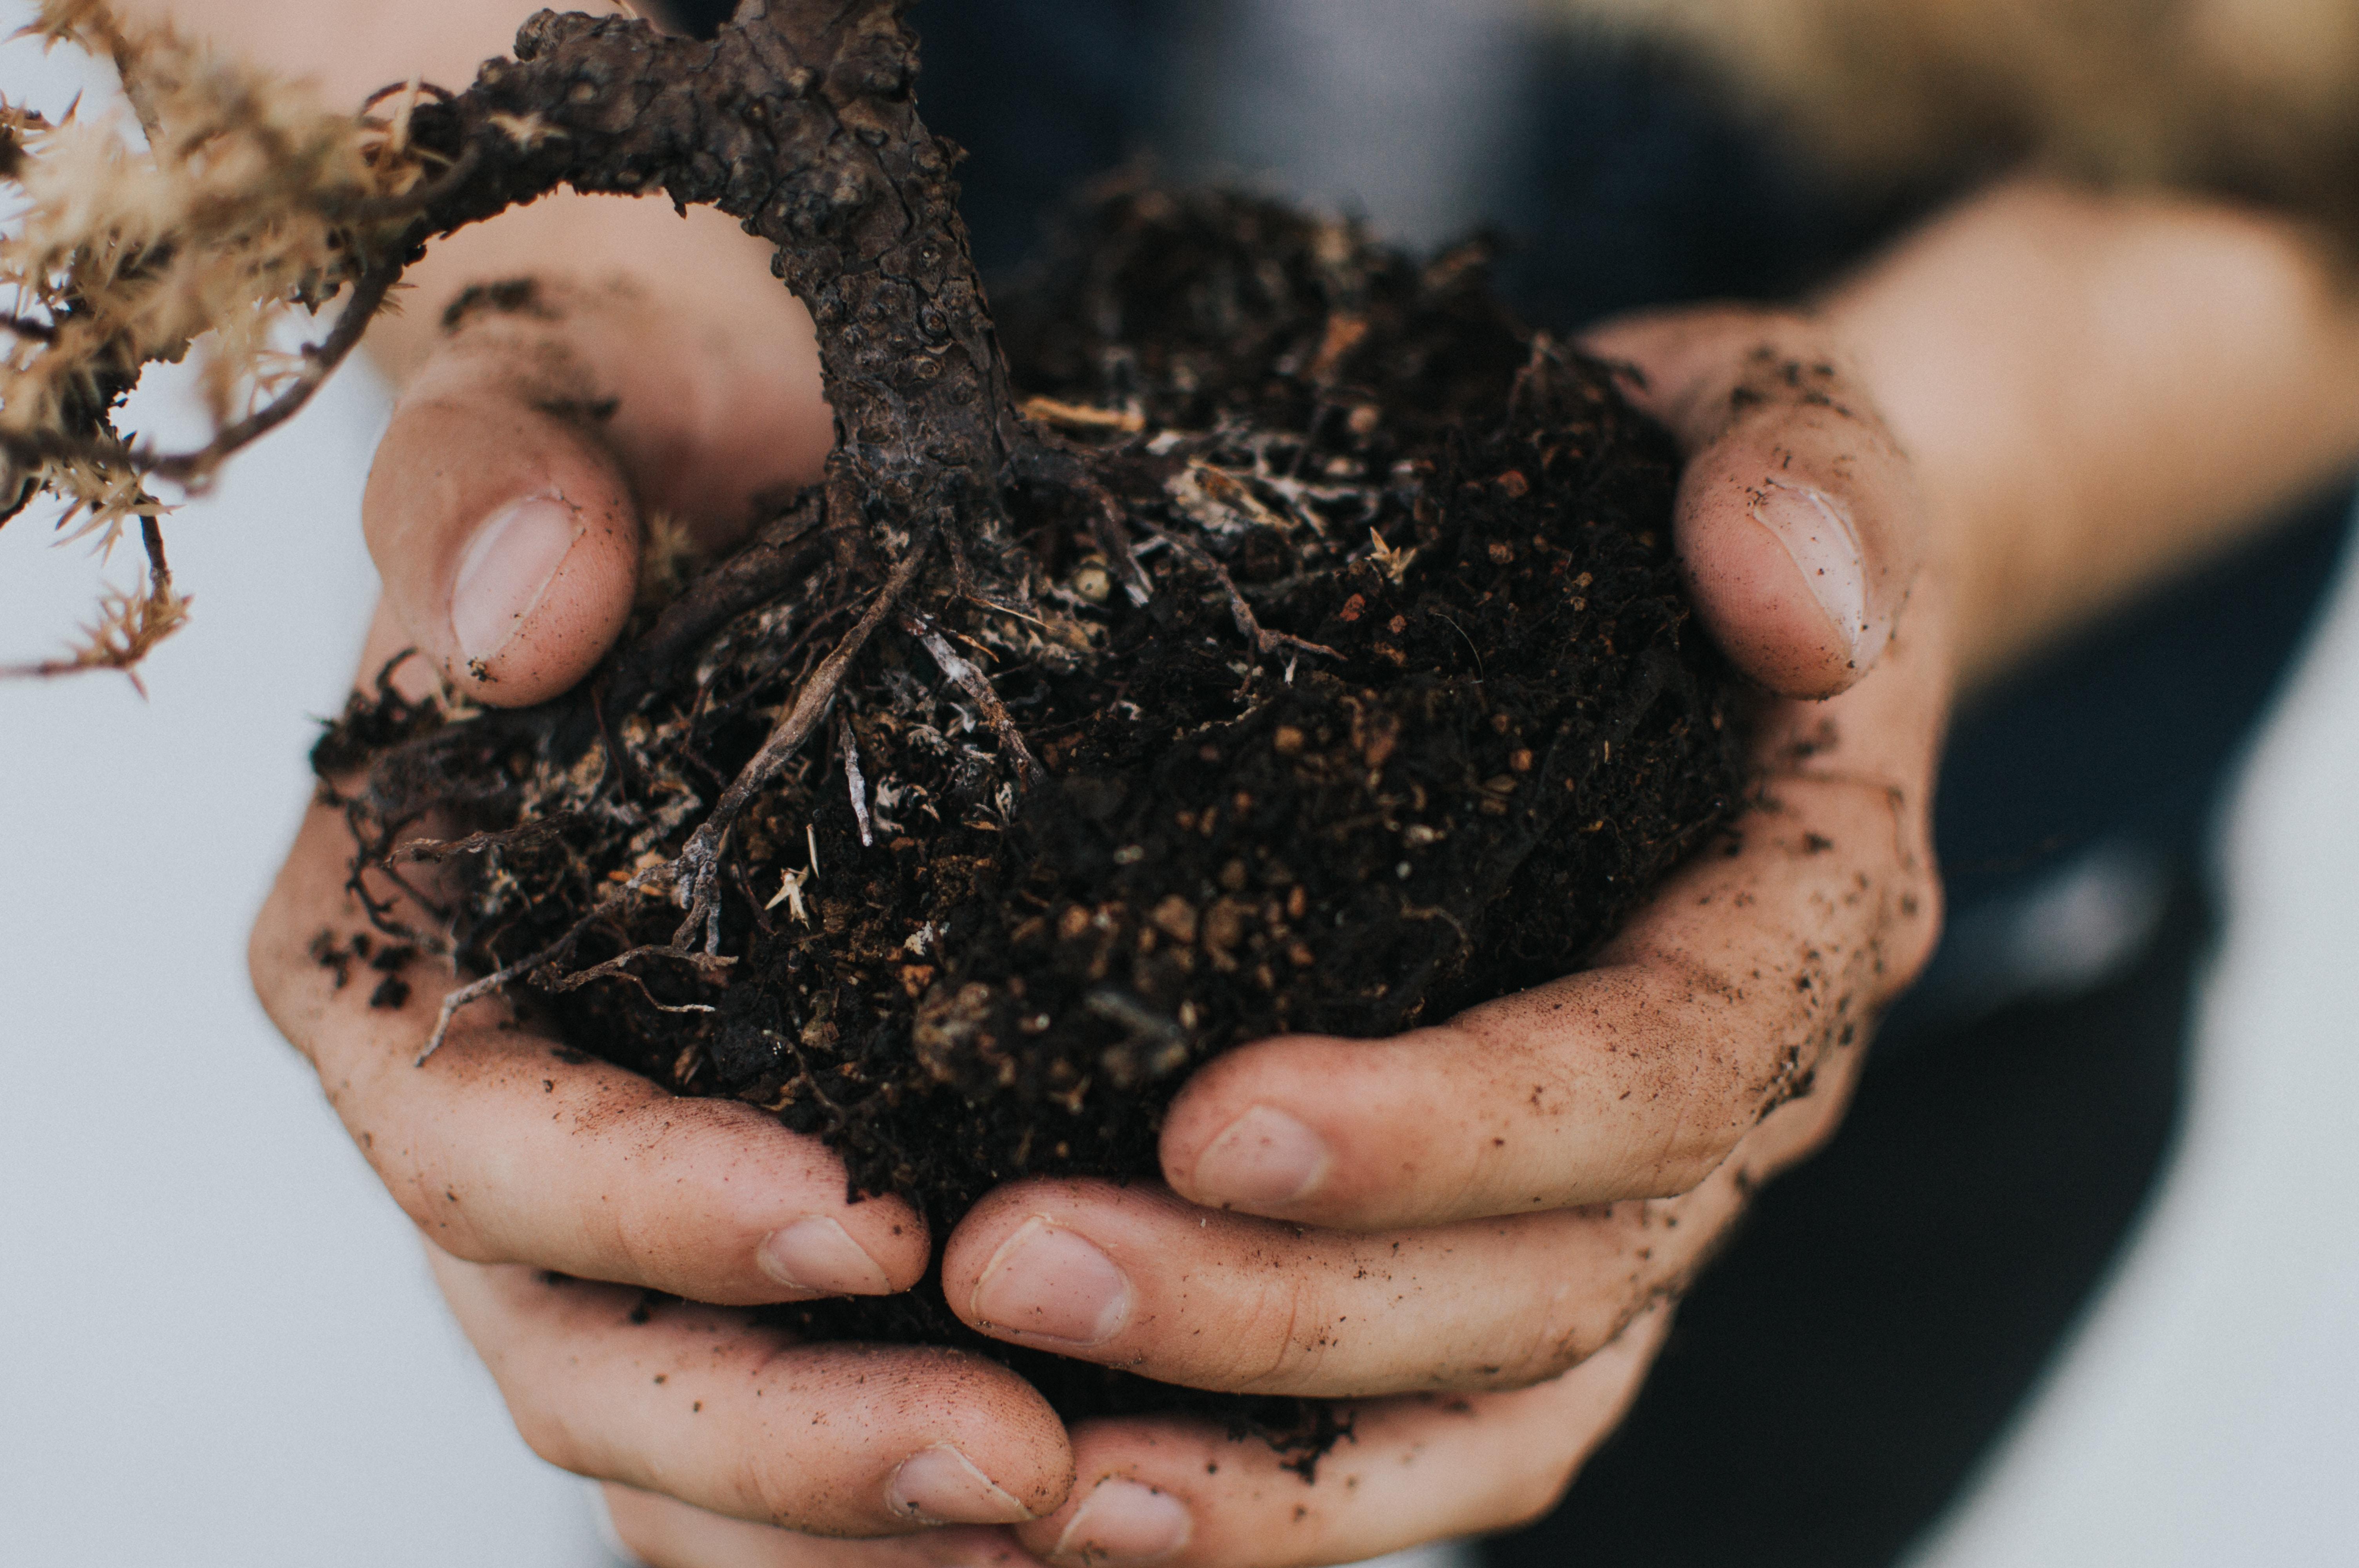 person holding plant stem